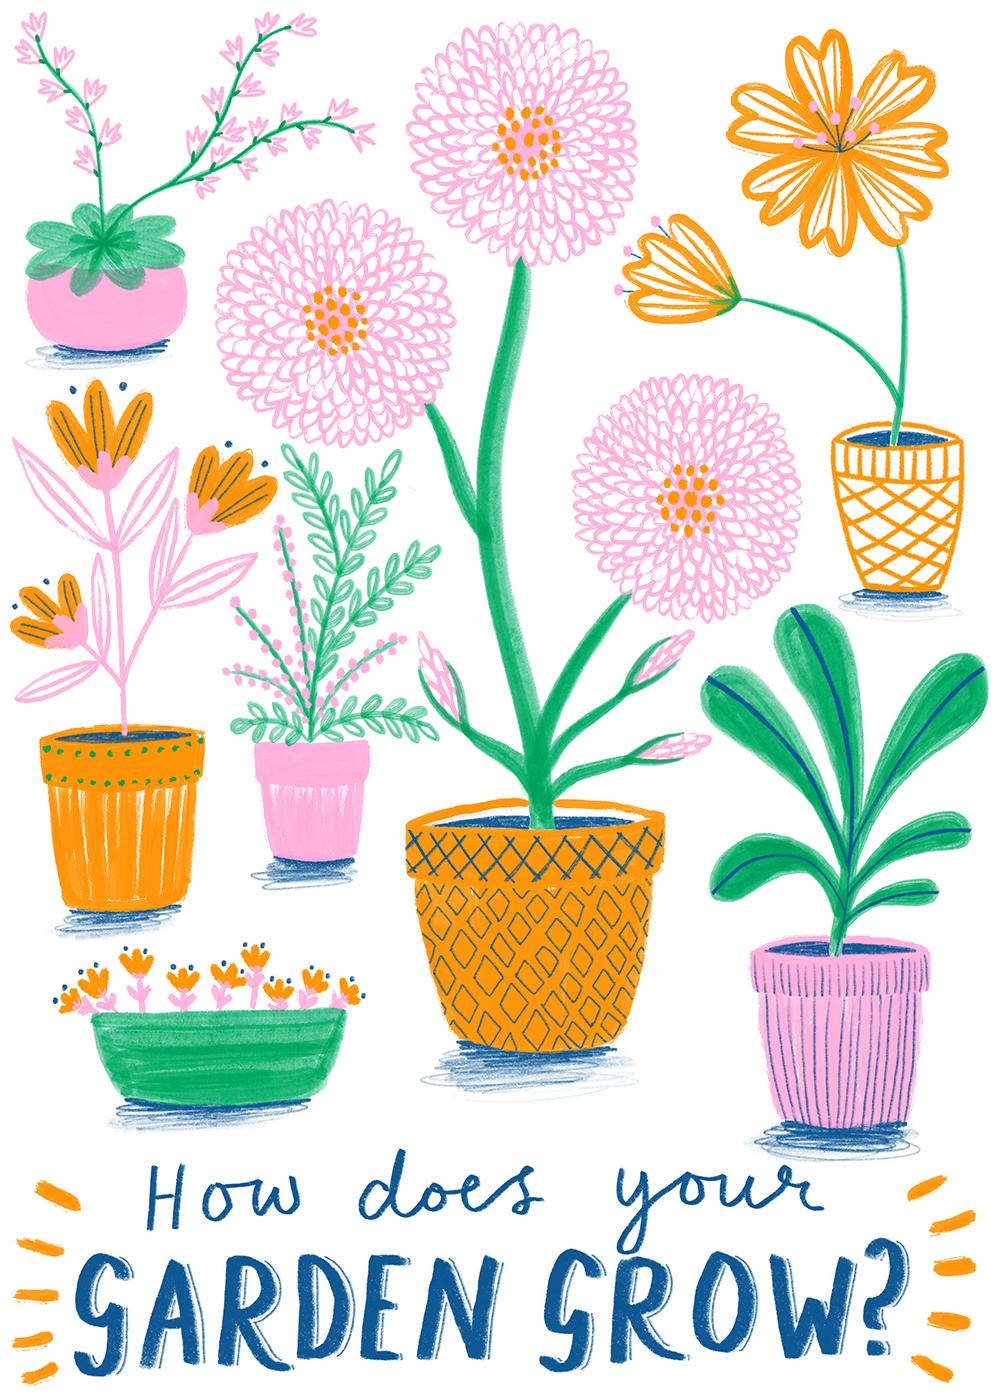 How Does Your Garden Grow? · Lee Foster-Wilson